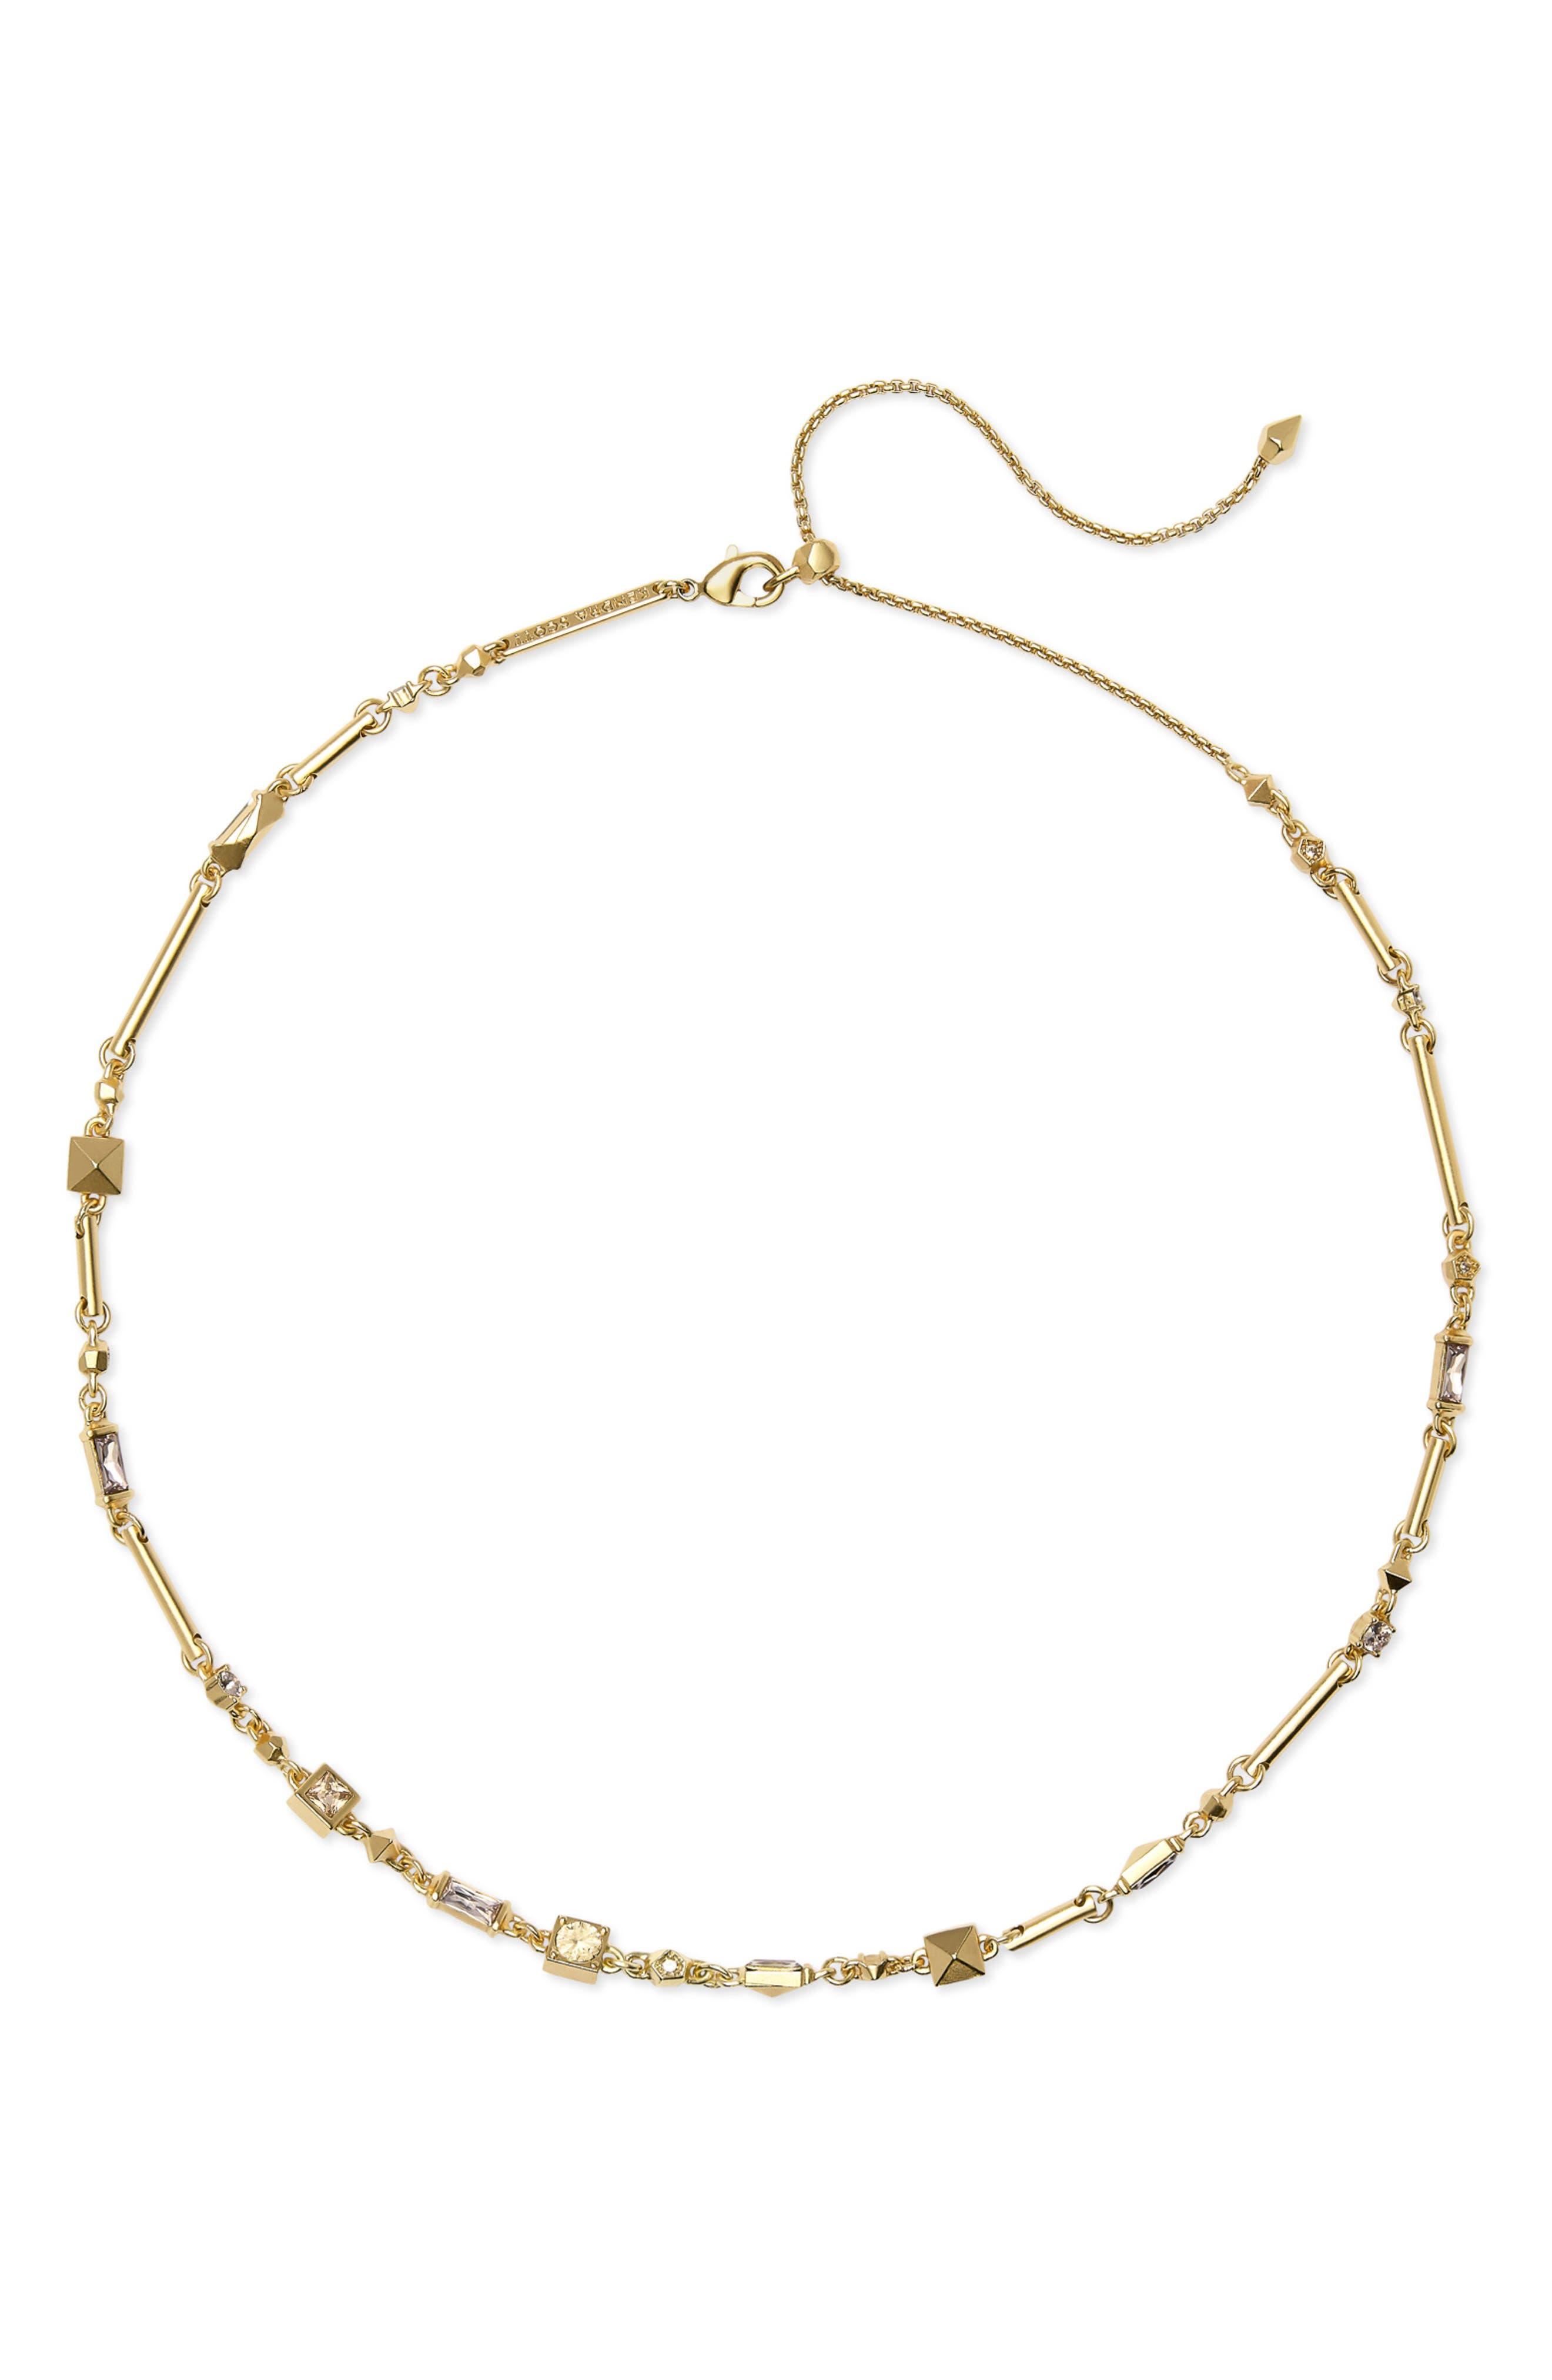 Rhett Collar Necklace,                         Main,                         color, SMOKY MIX/ GOLD